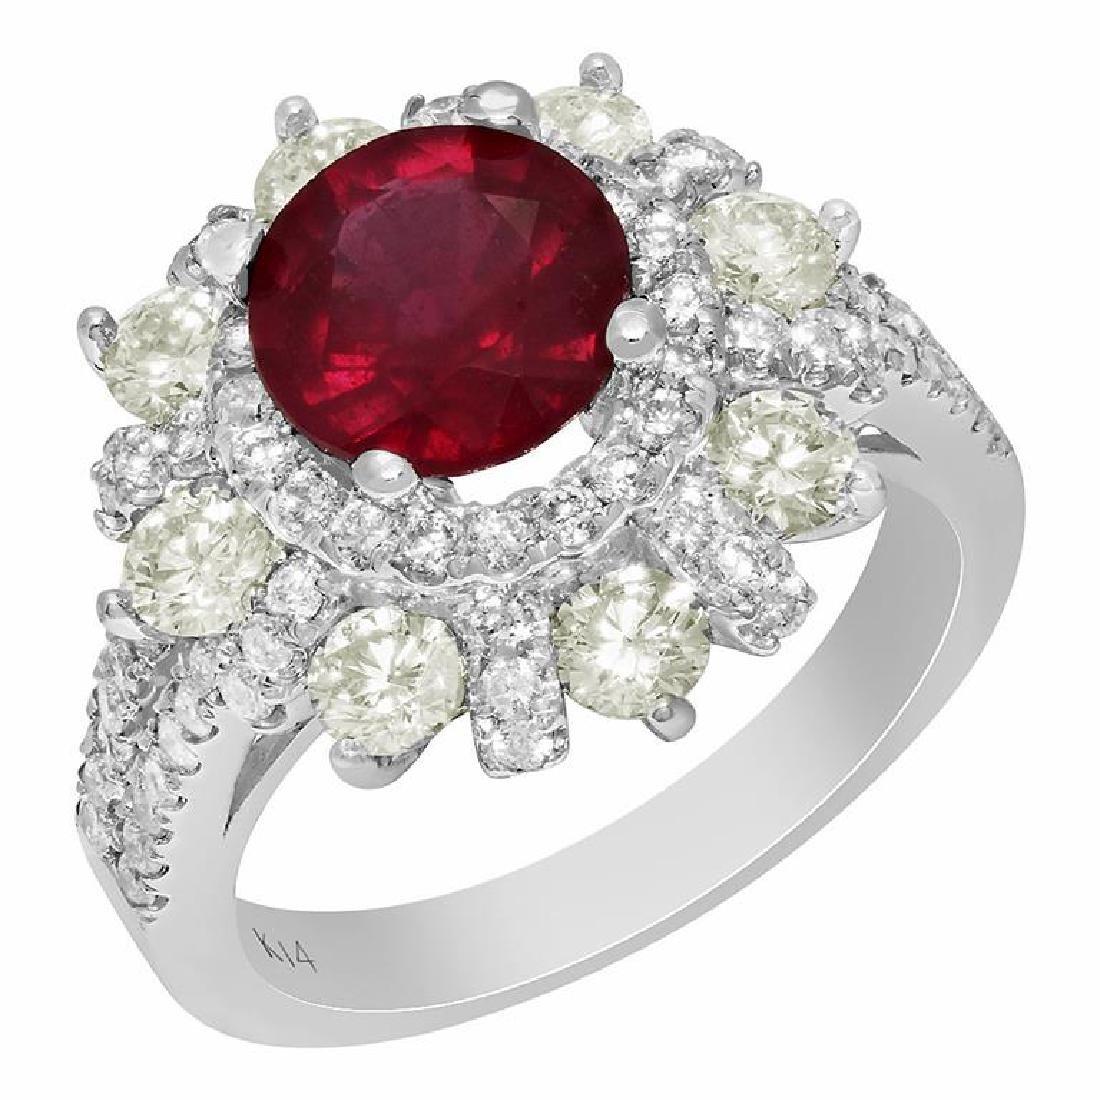 14k White Gold 2.20ct Ruby 1.88ct Diamond Ring